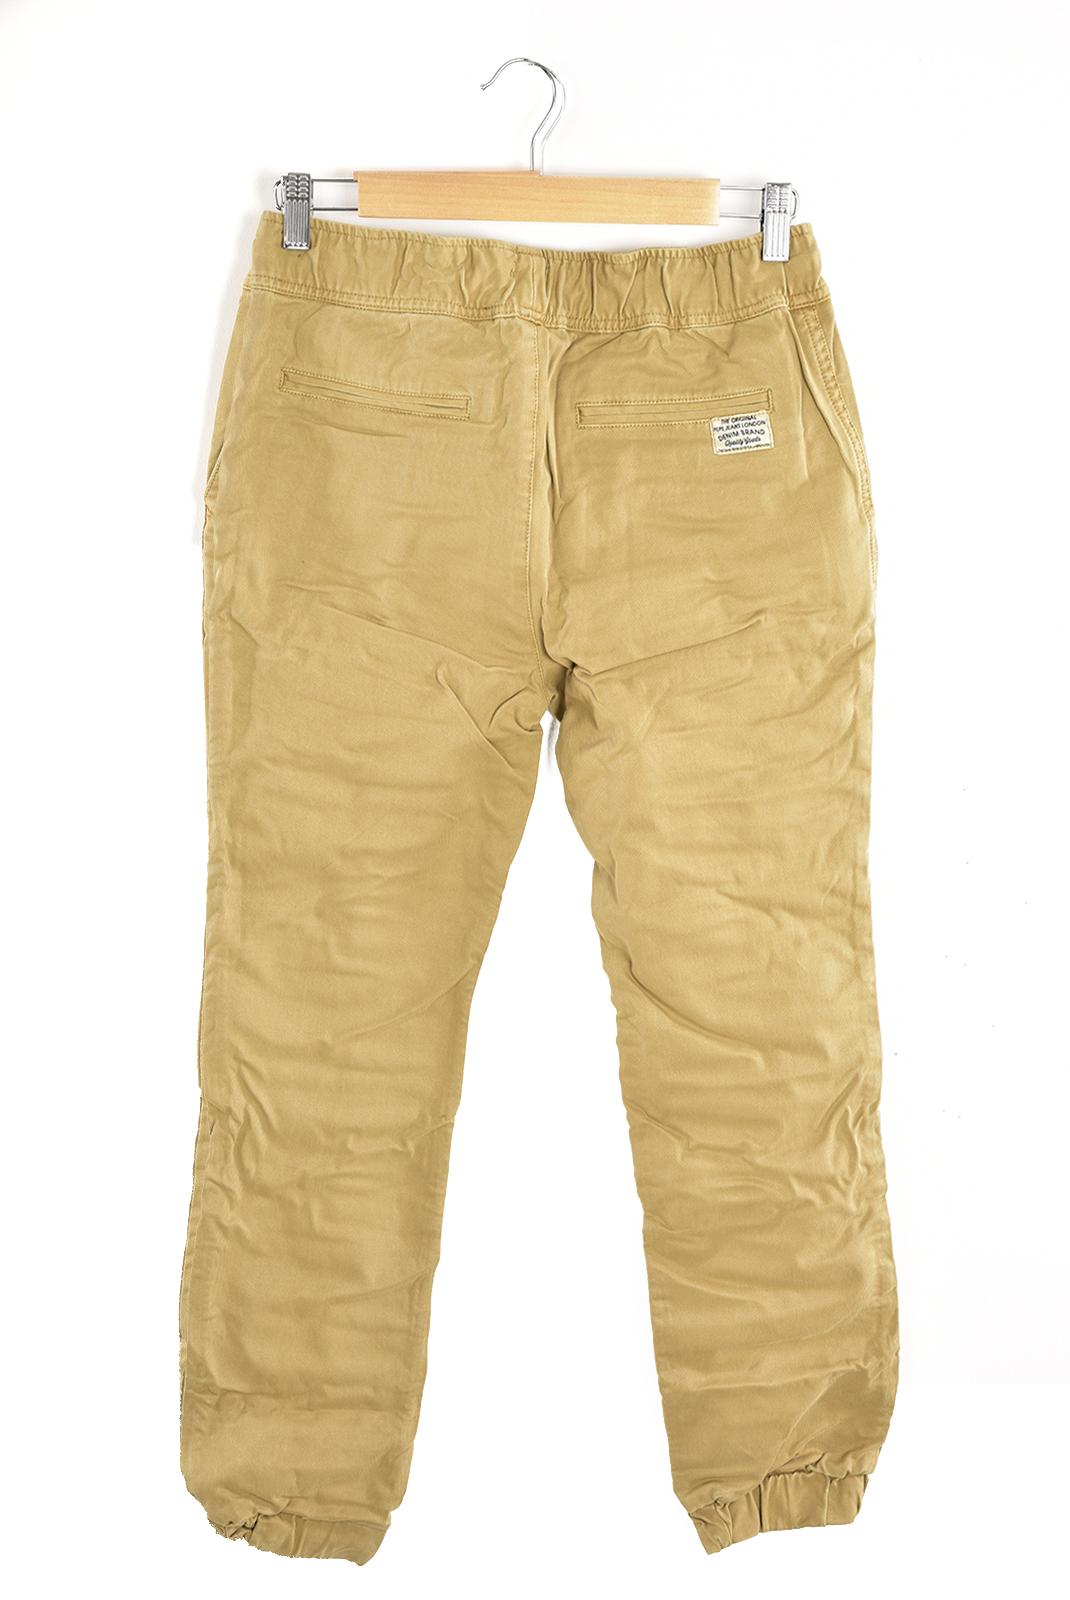 Bas  Pepe jeans PB210226 alan 855